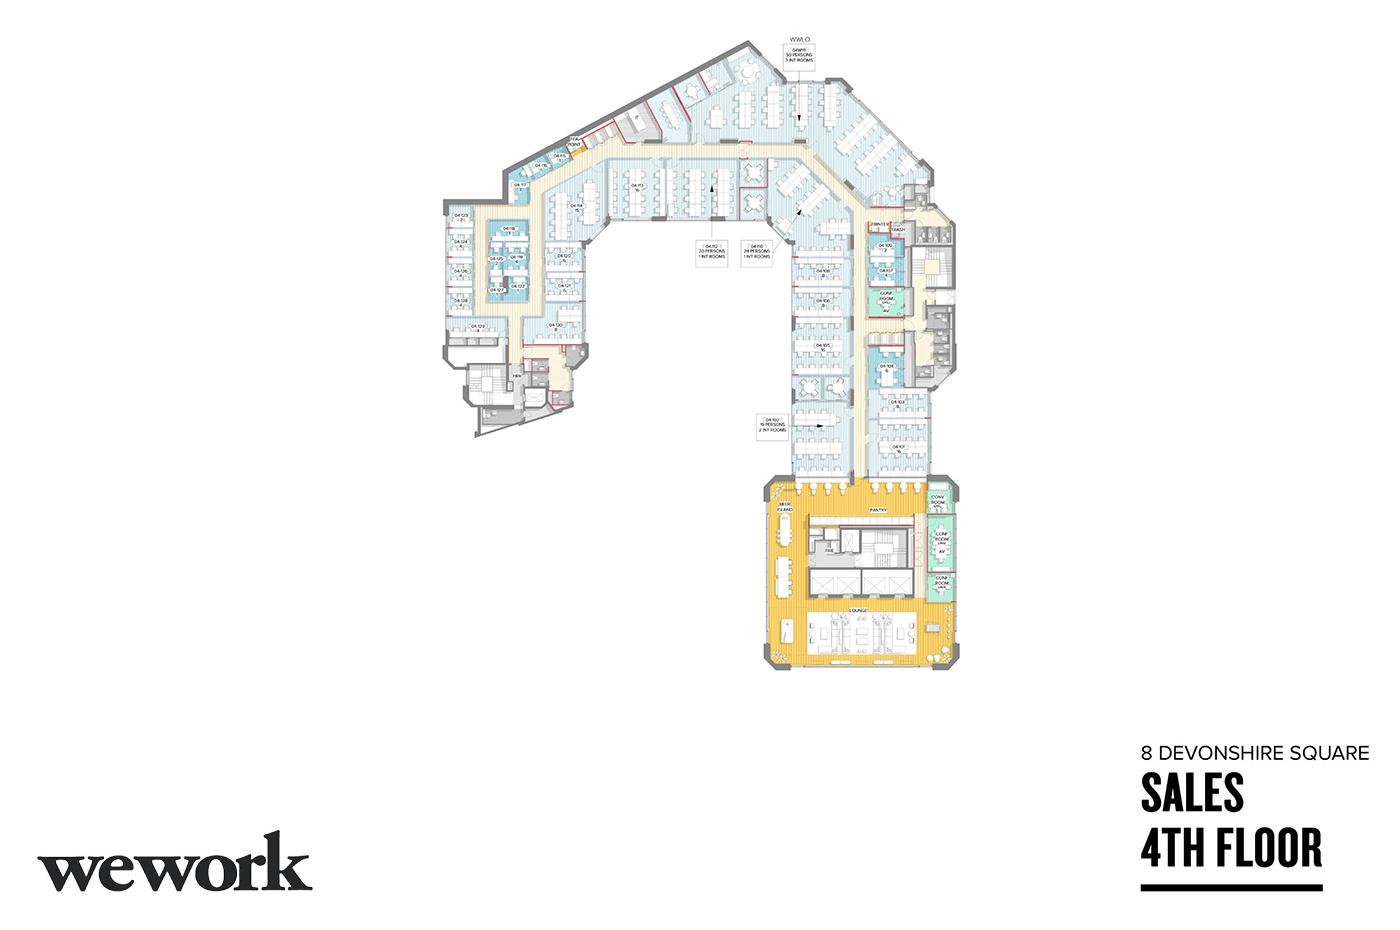 floorplans-5 copy.jpg